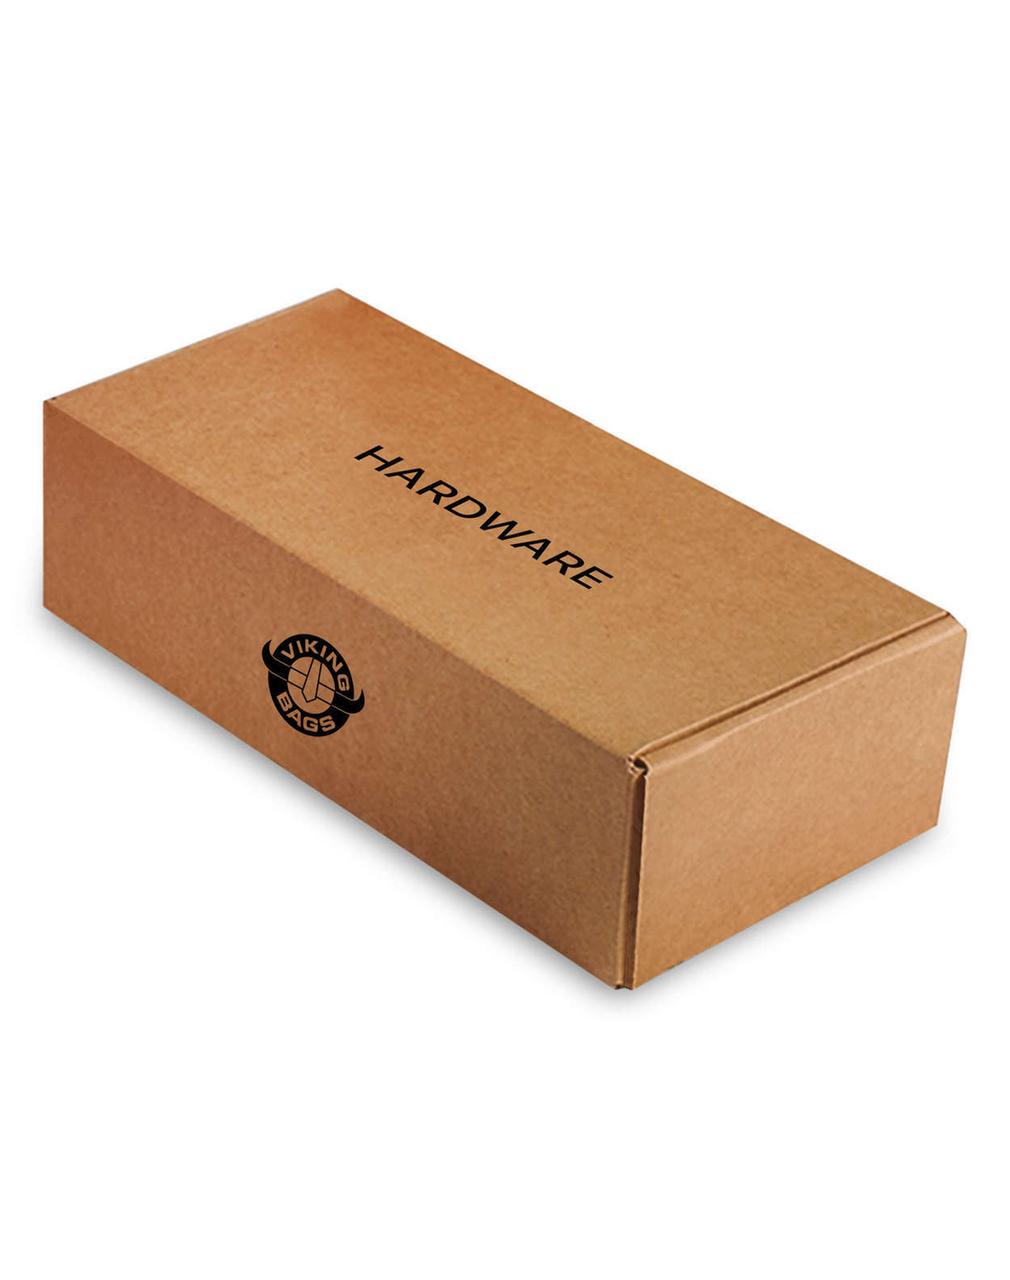 Honda VTX 1300 Retro Charger Side Pocket With Shock Cutout Motorcycle Saddlebags Hardware Box